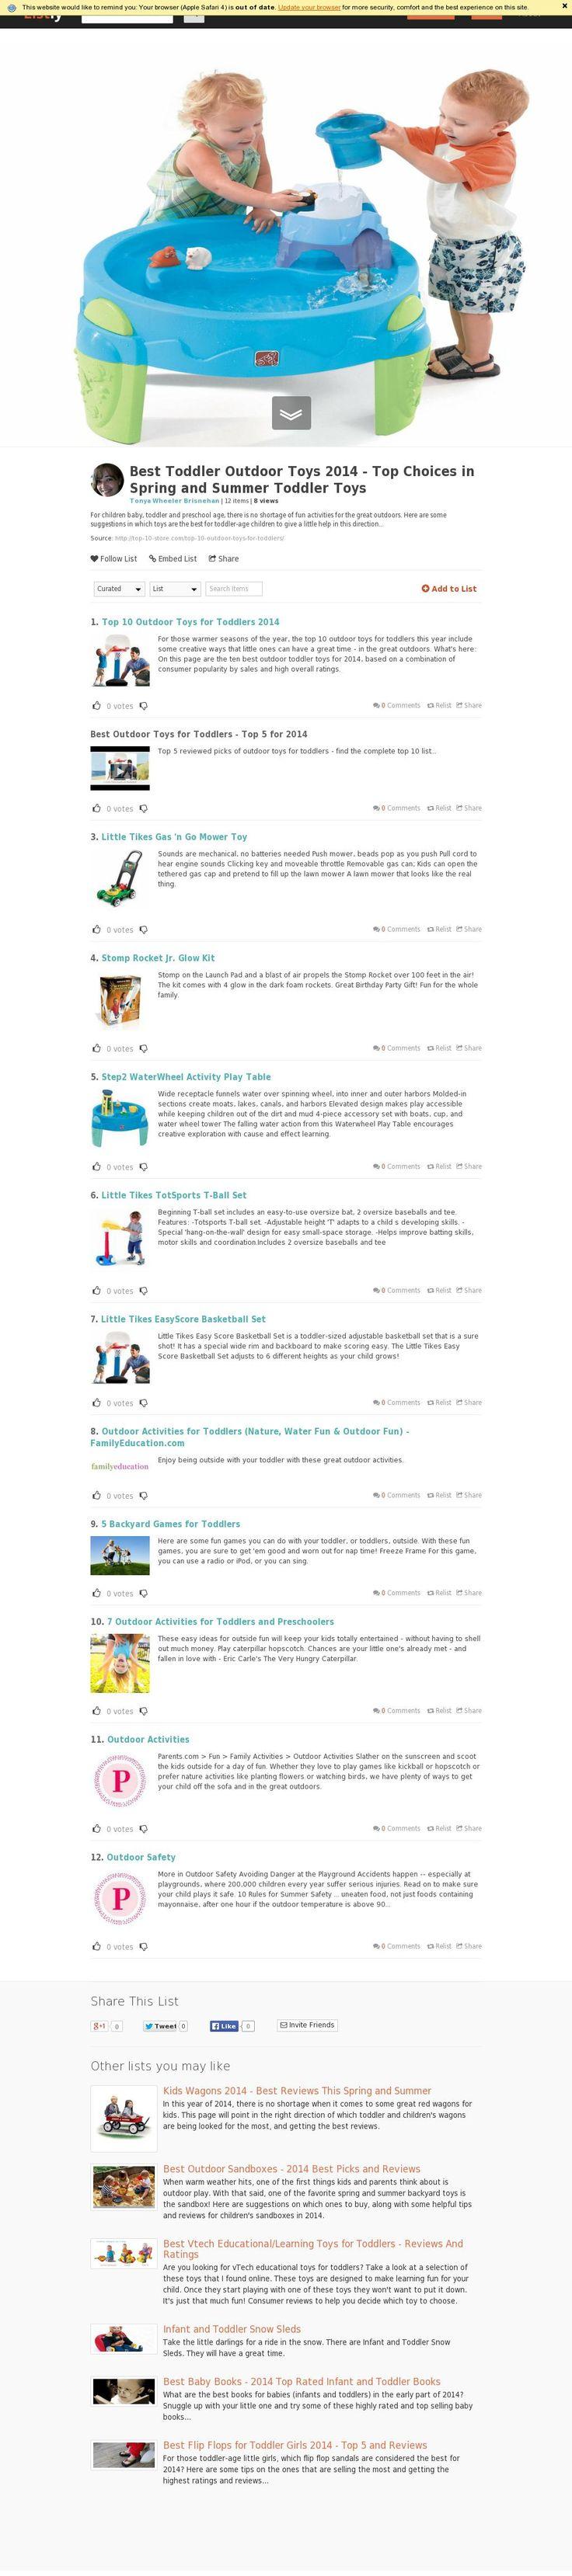 25 ideias exclusivas de Toddler outdoor toys no Pinterest